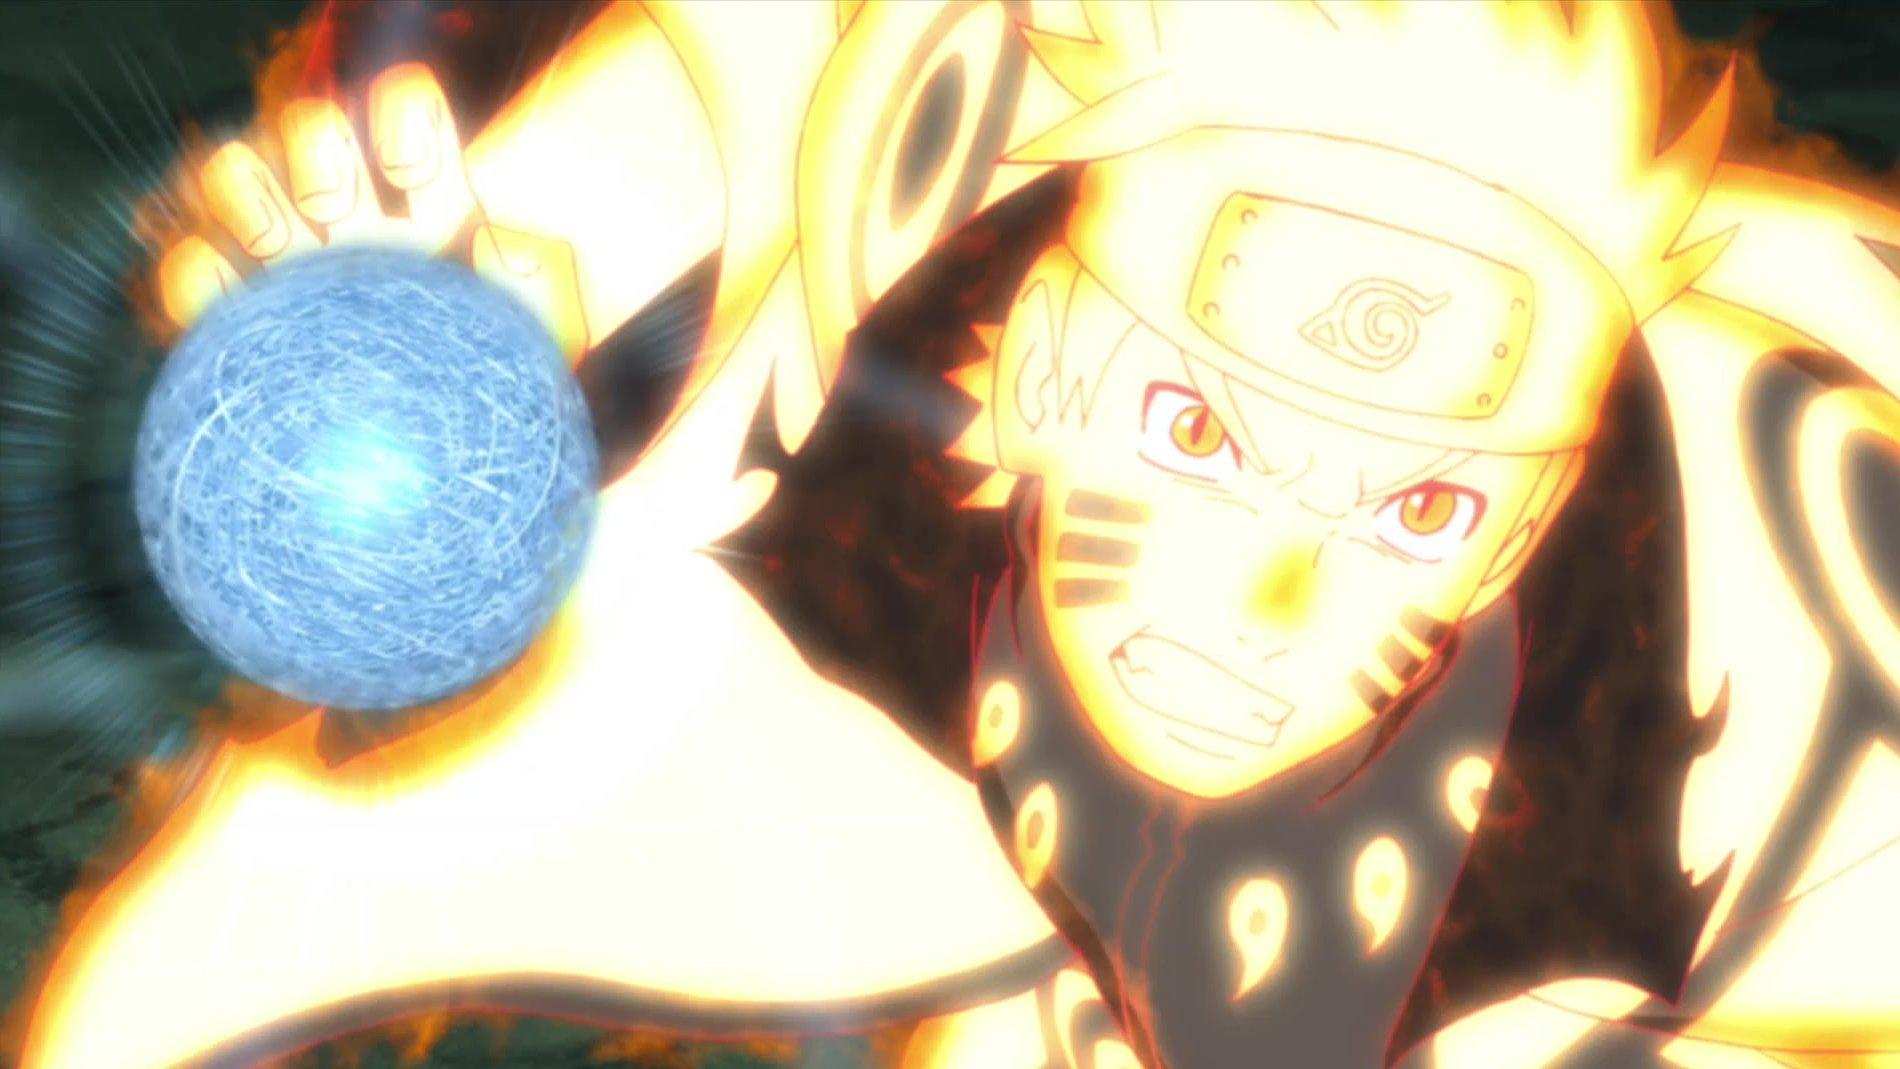 Wann Kommt Naruto Shippuden Auf Netflix